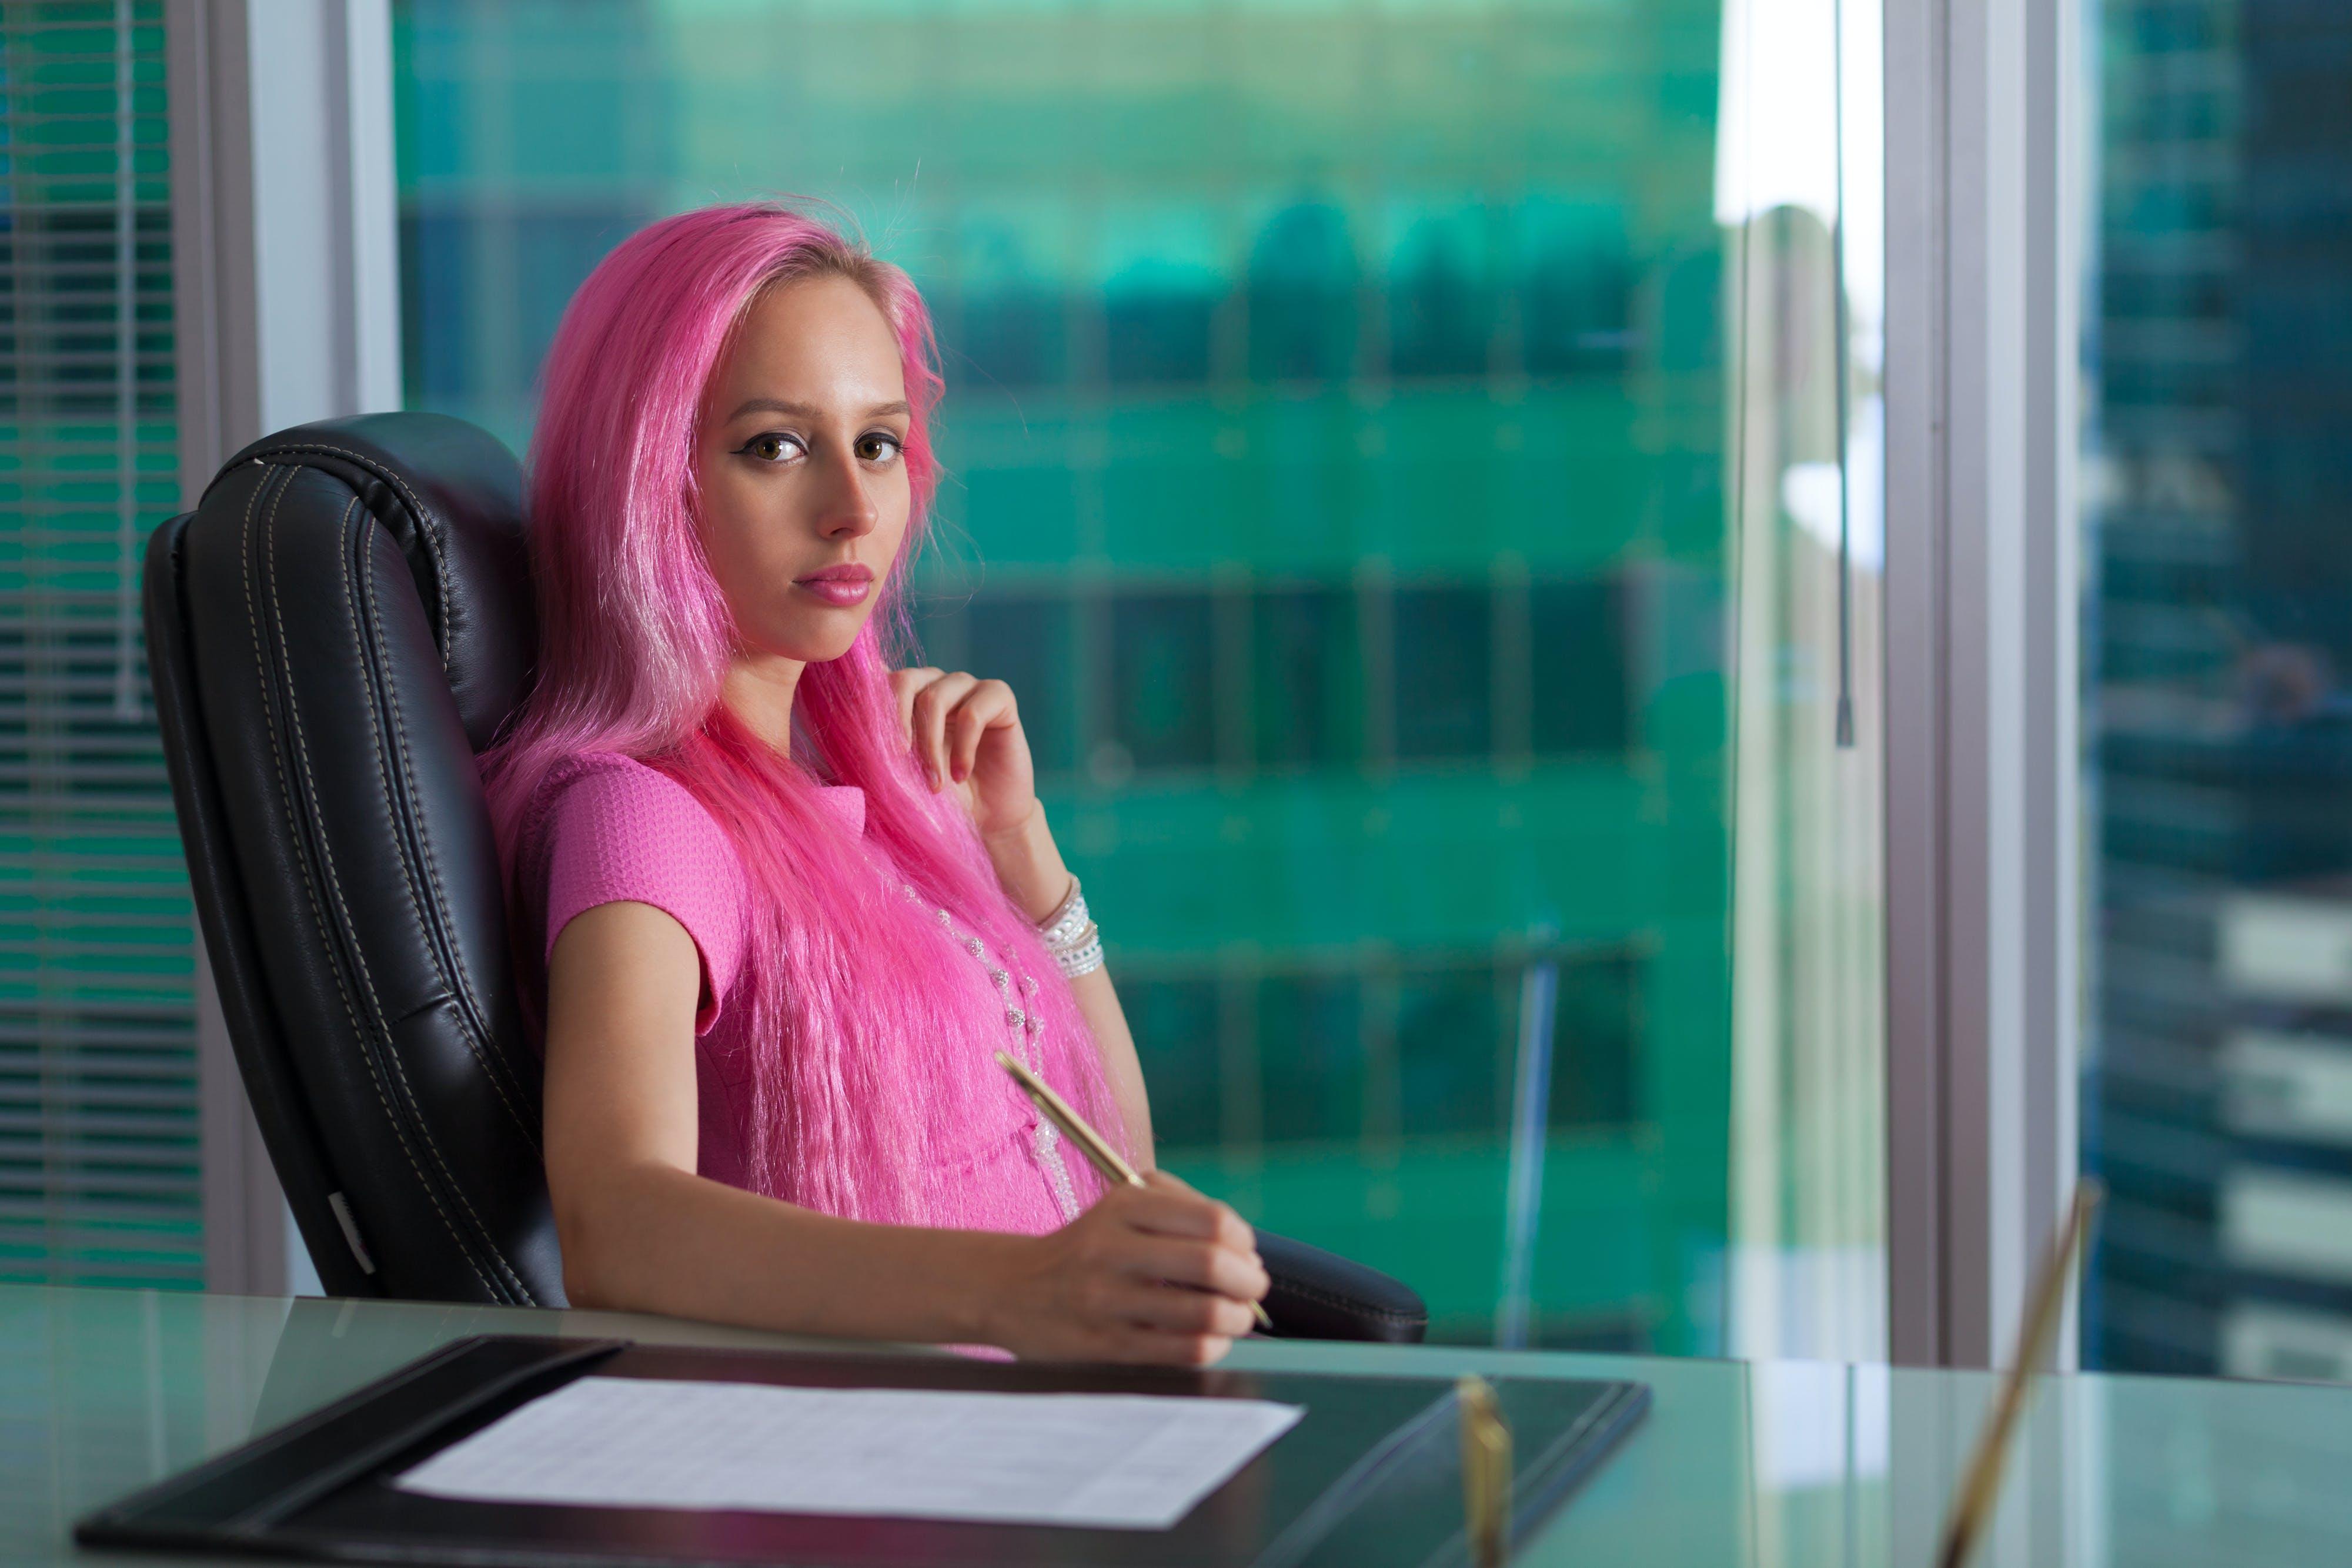 Free stock photo of boss, business, business woman, city